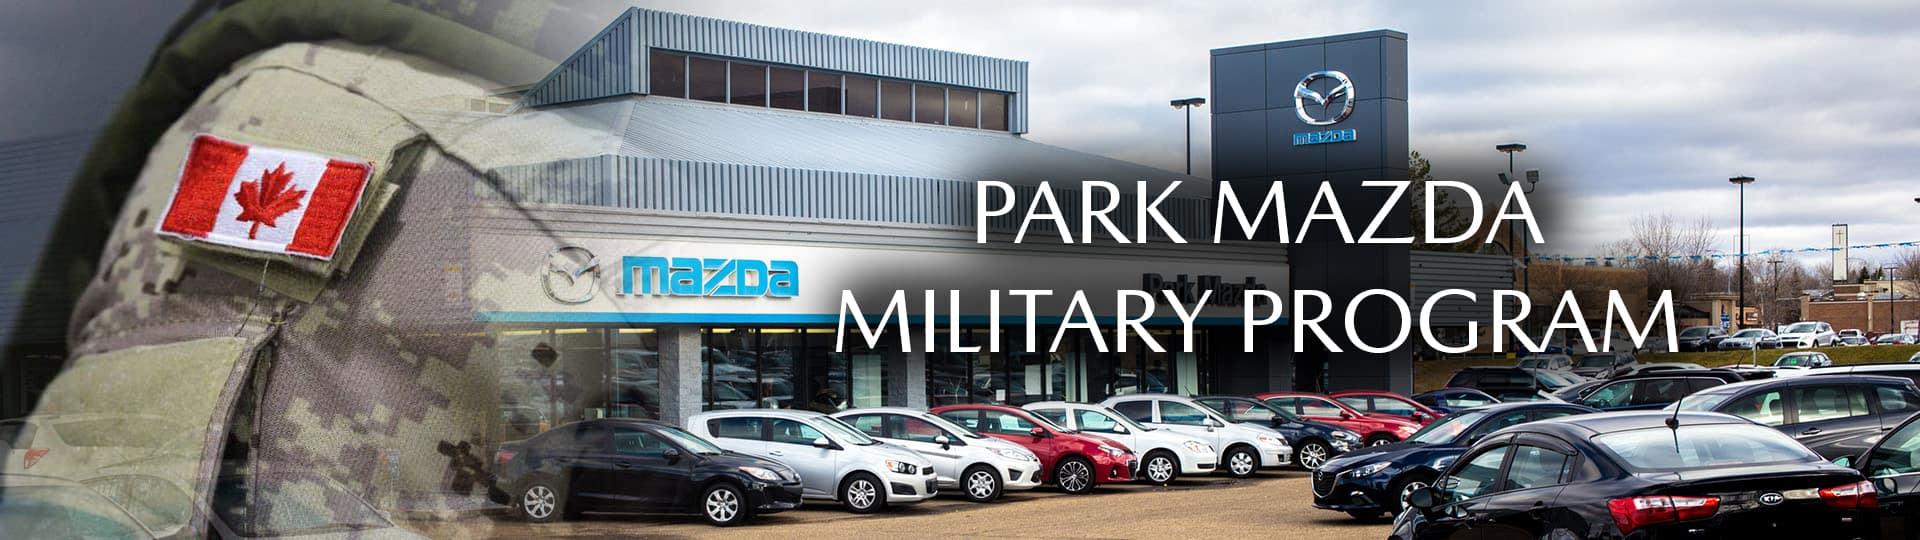 sherwood-park-mazda-exterior-military-1920x540